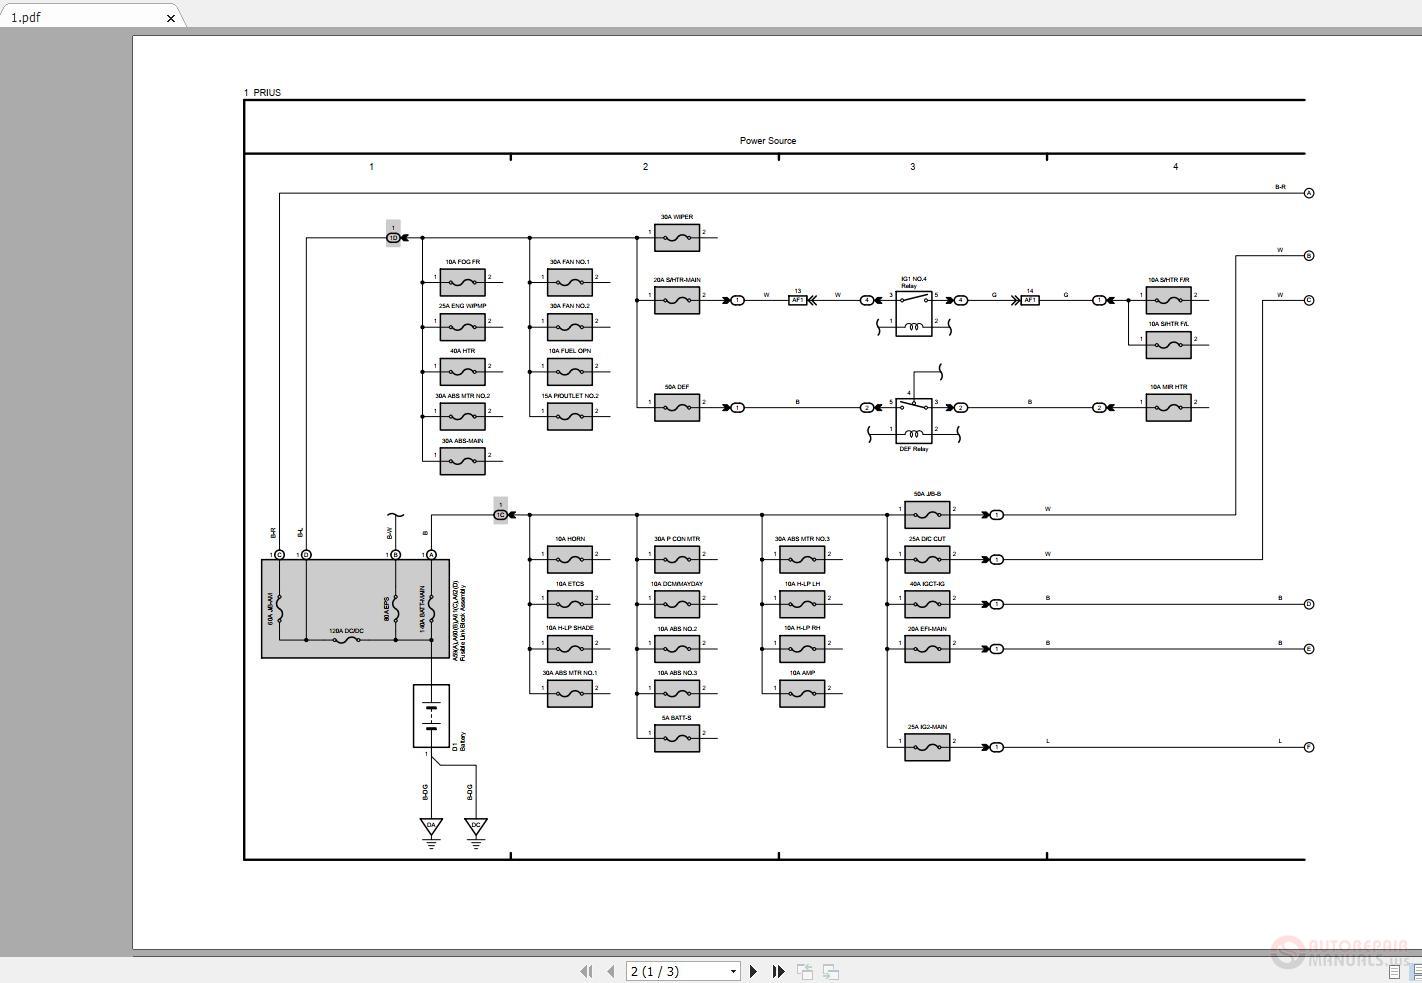 Toyota Prius 2016-2018 Electrical Wiring Diagram